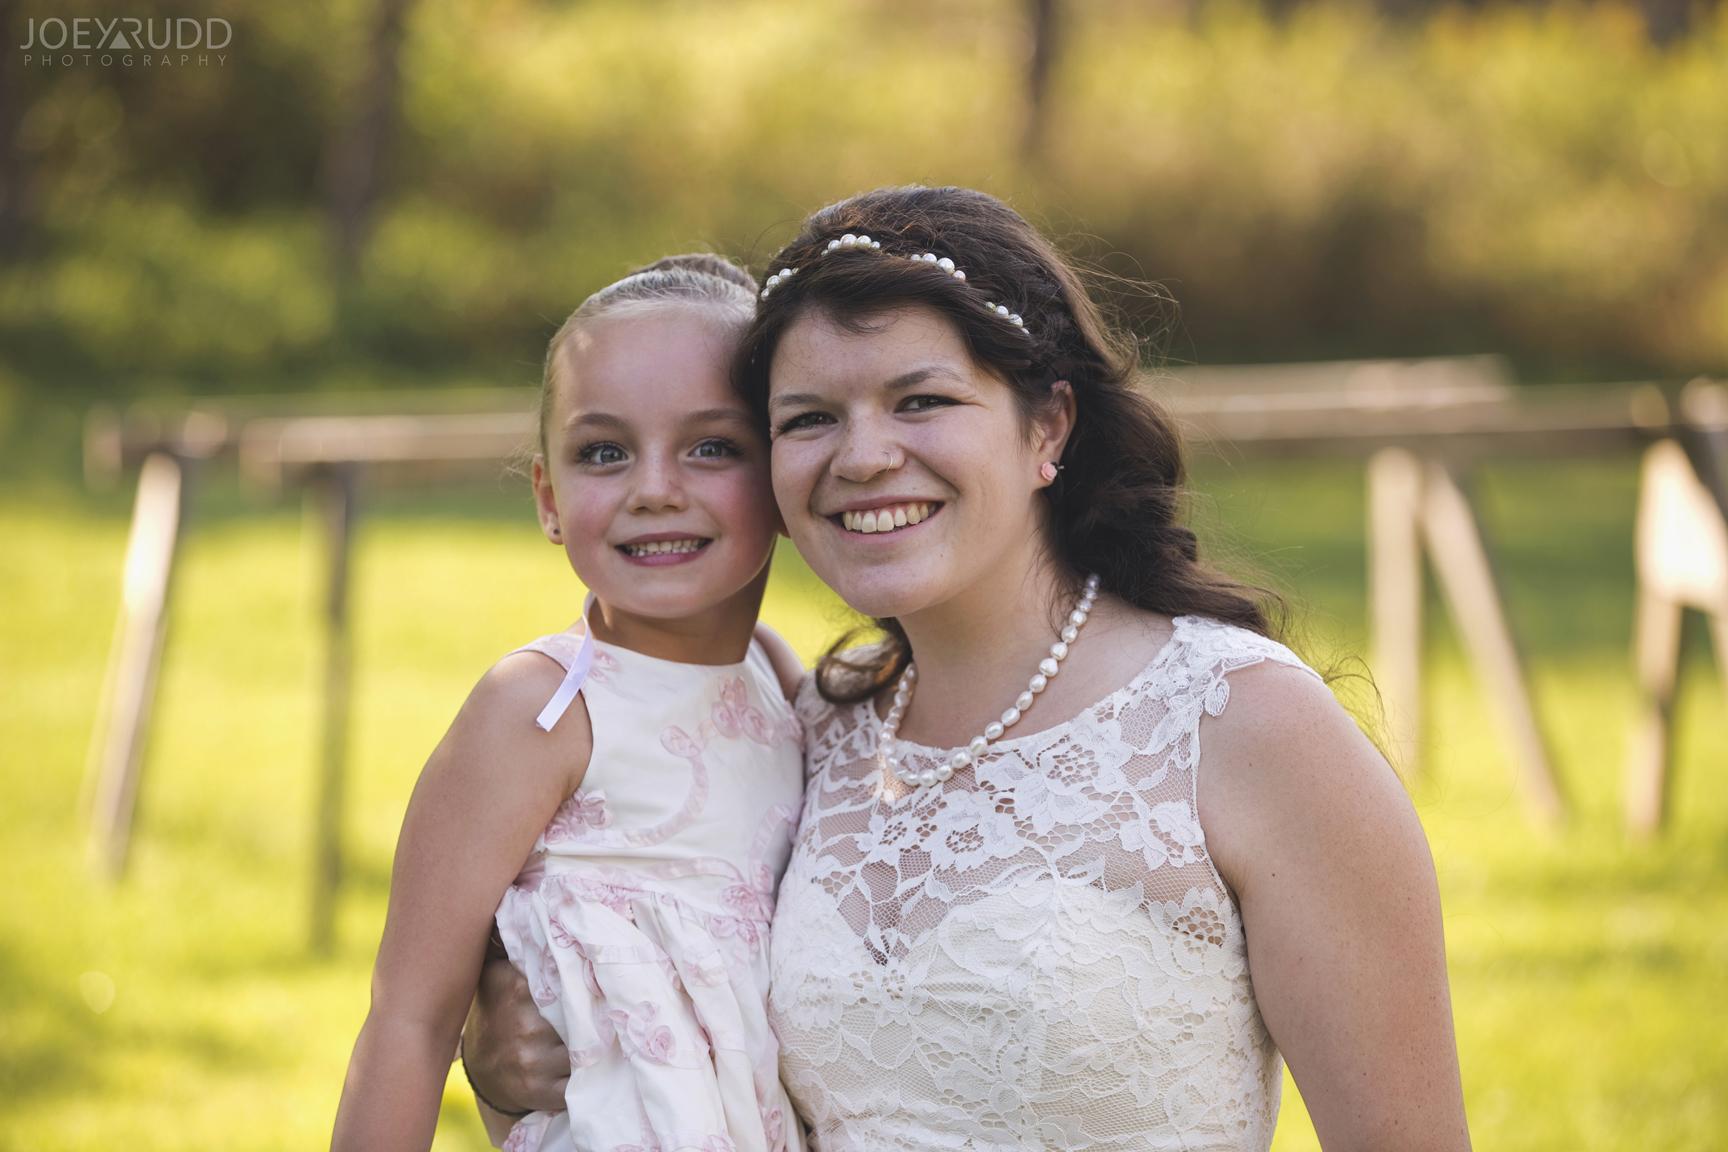 Backyard Kingston Wedding by Ottawa Wedding Photographer Joey Rudd Photography Family